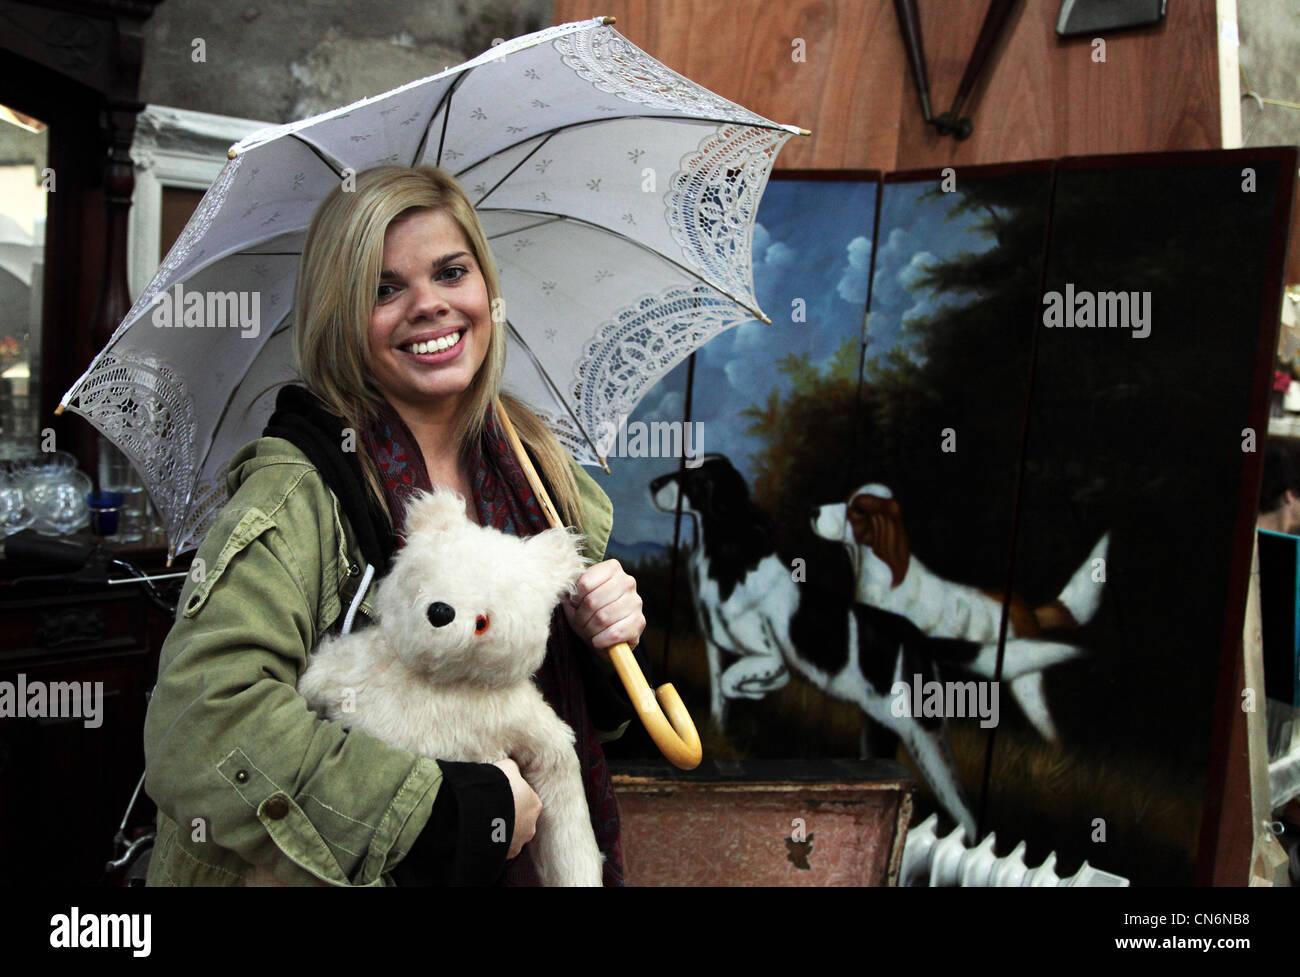 Sarah Lennon with a parasol and Paddington Bear at Merchants Yard car boot sale, Merchants Yard, Dublin, Ireland - Stock Image